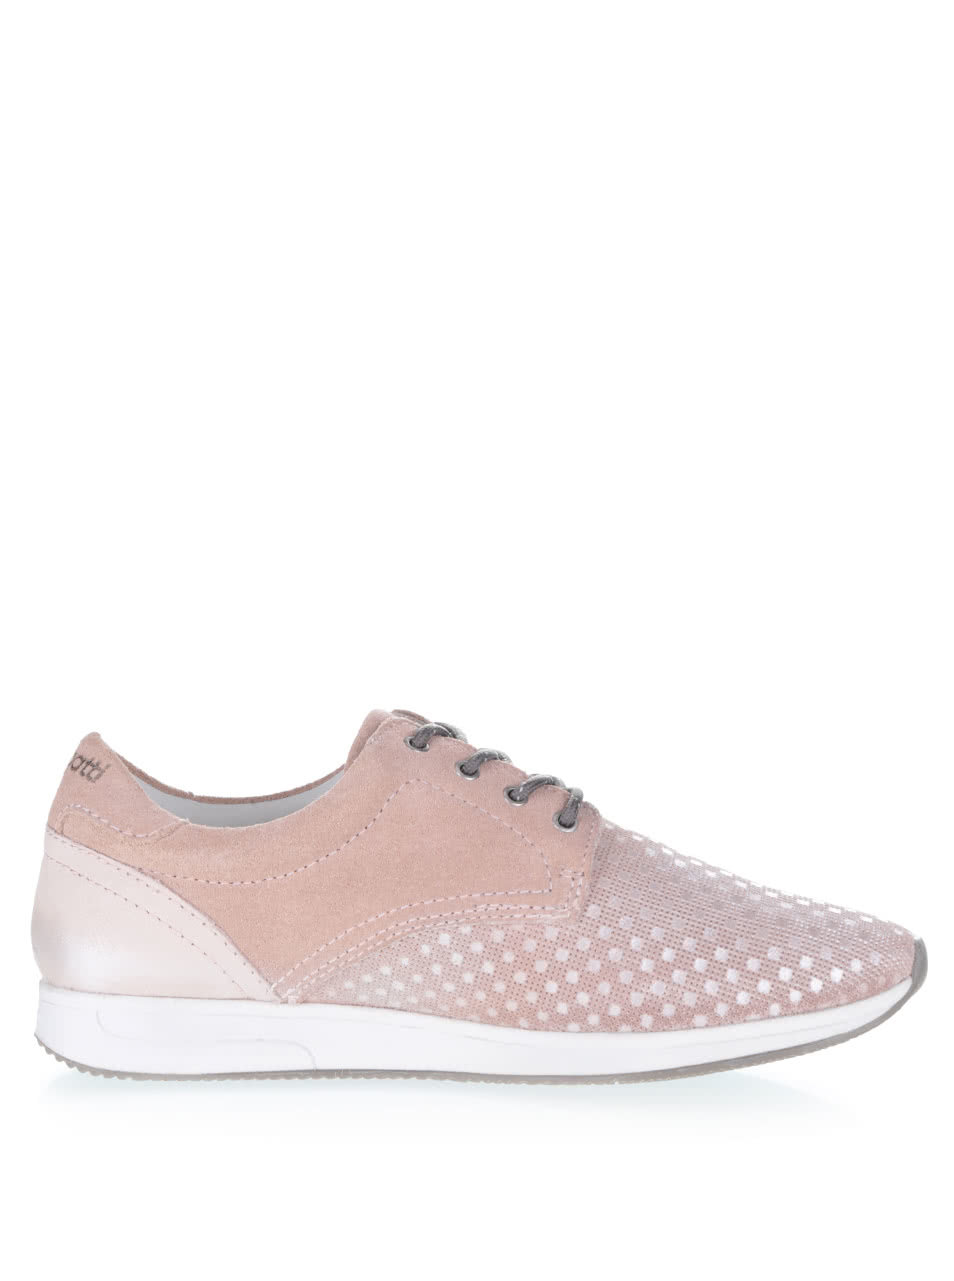 Ružové dámske semišové tenisky bugatti ... 6a76233a309